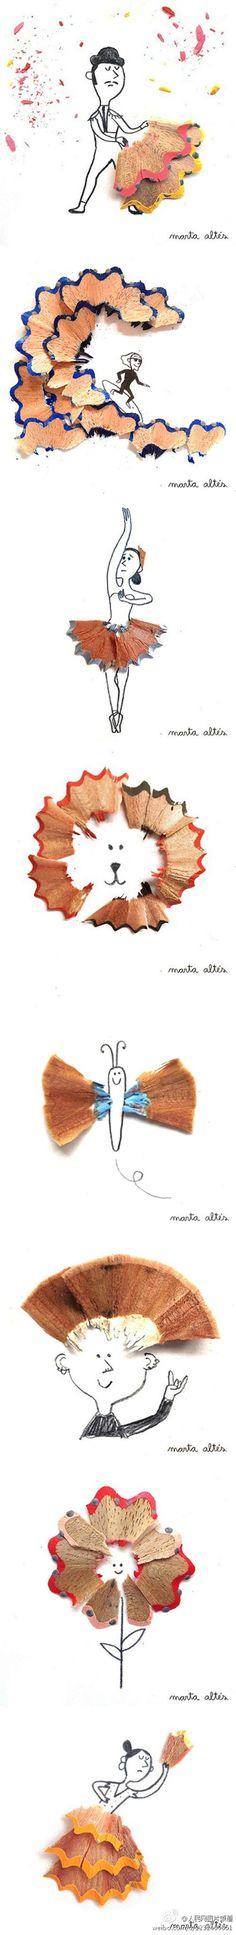 craft, marta alt, shaving, pencil shave, pencil art, illustr, kid, shave art, pencils